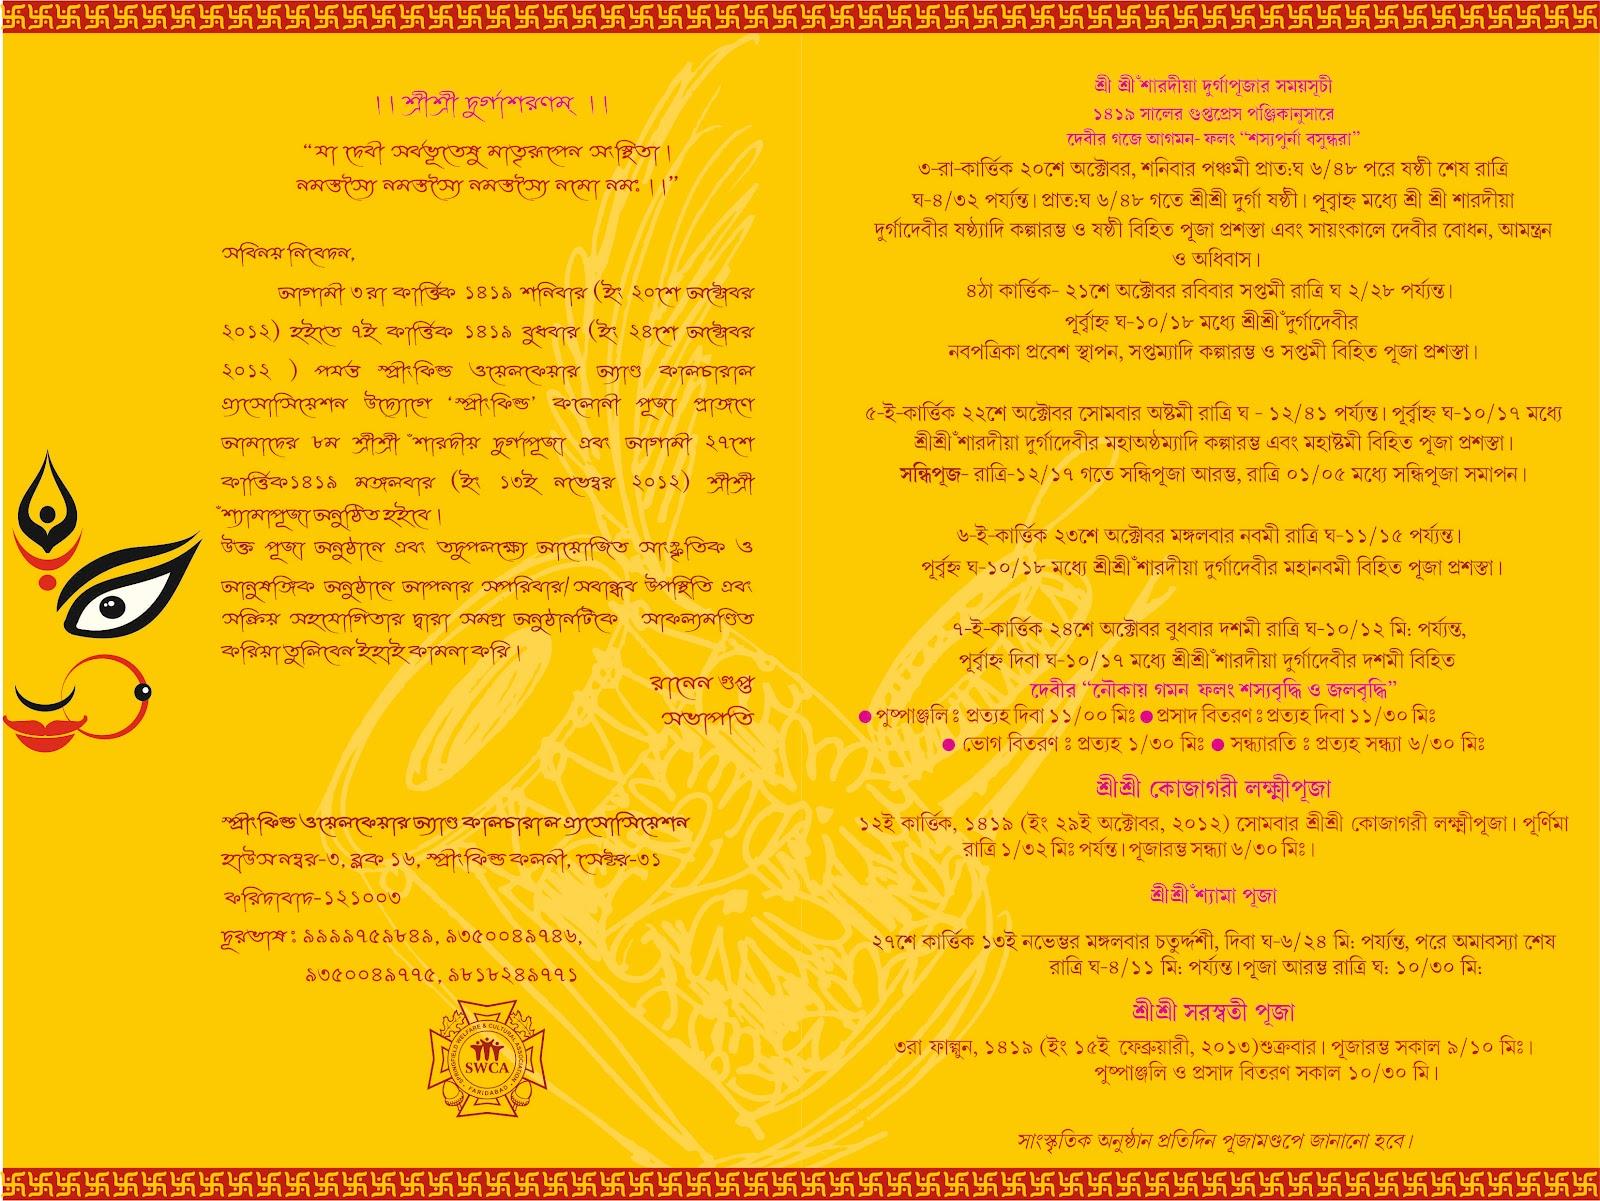 Springfield Welfare Cultural Association Invitation For Durga